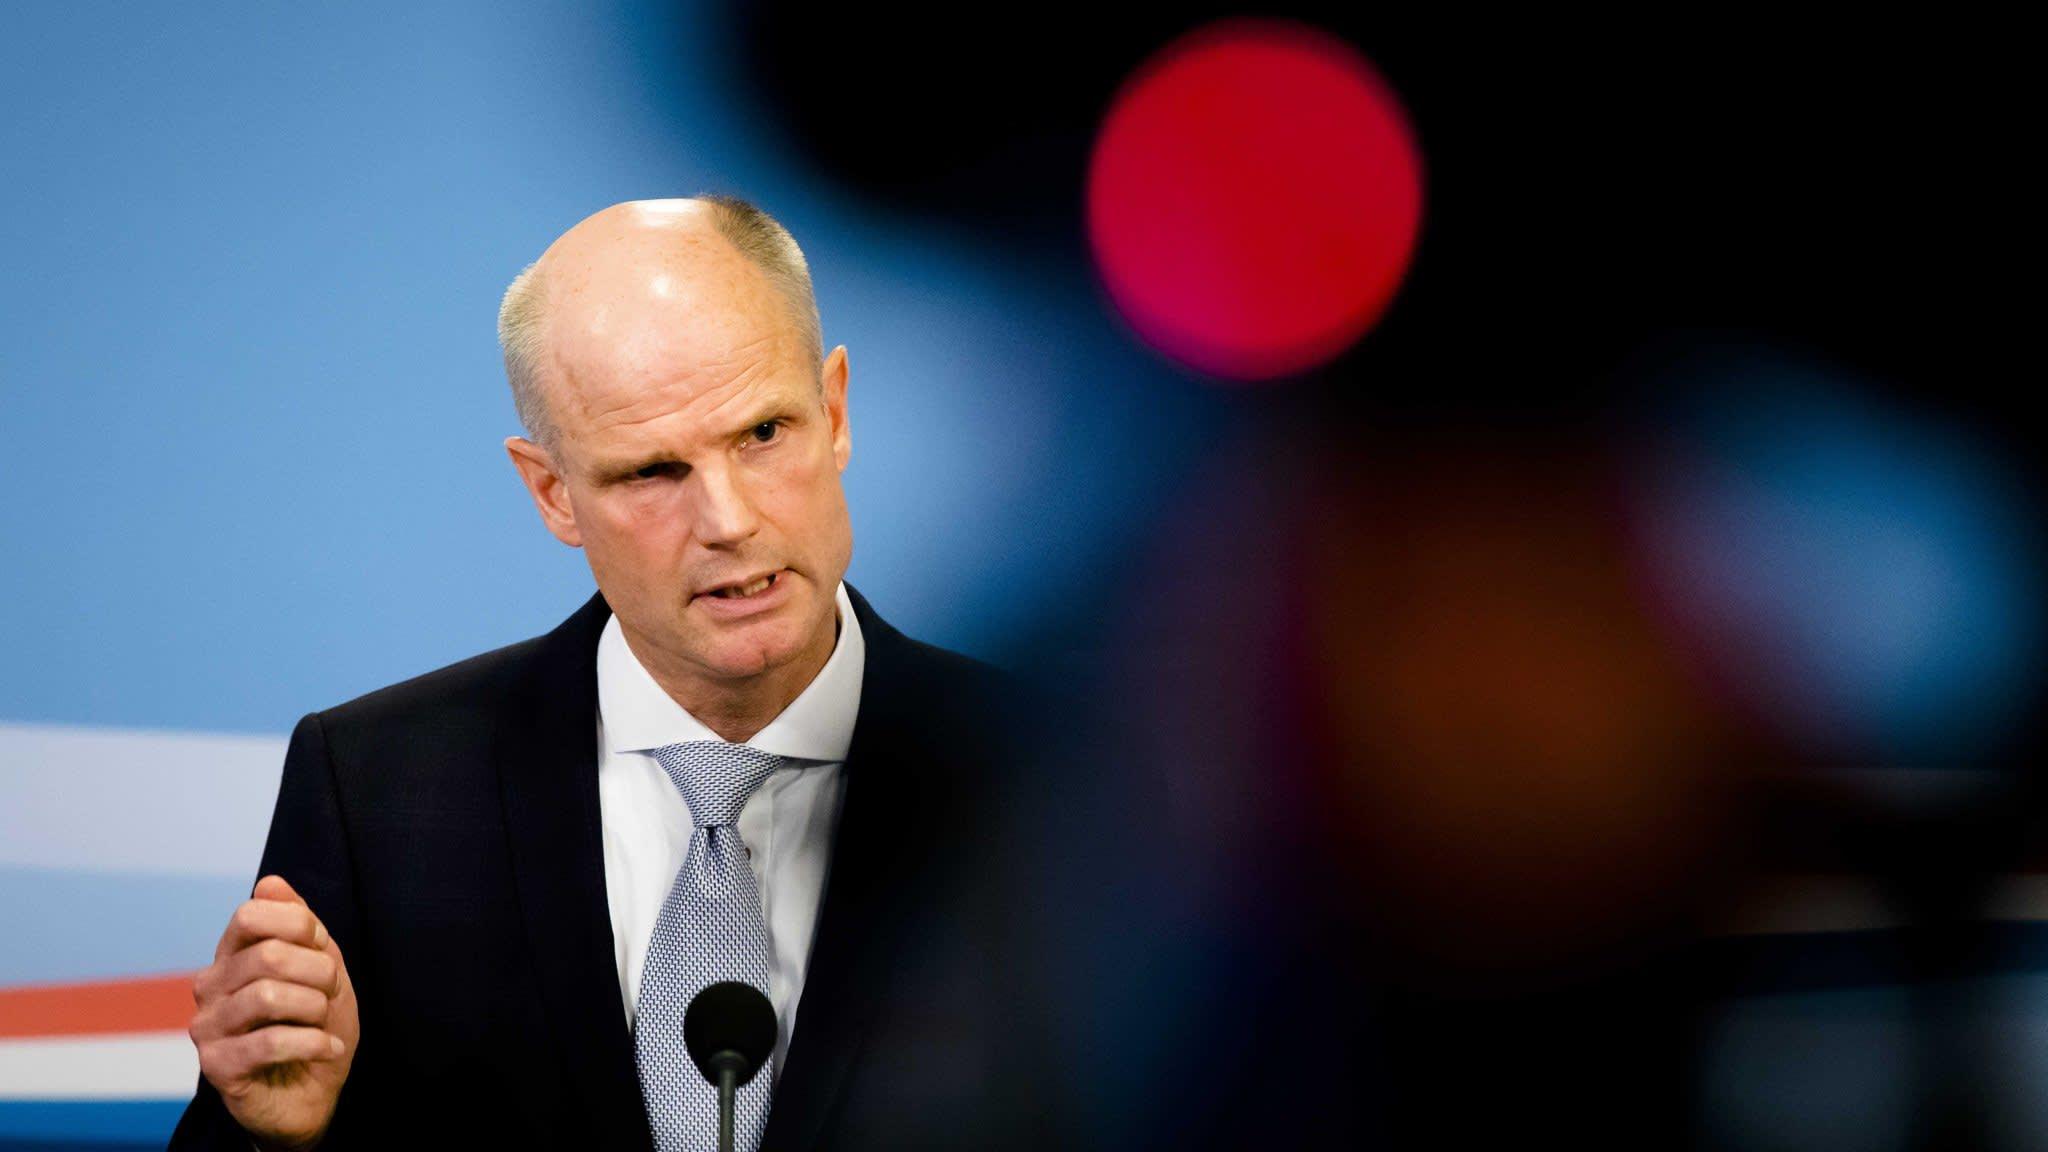 Wilders One Man Band Heads For Dutch Poll Destiny